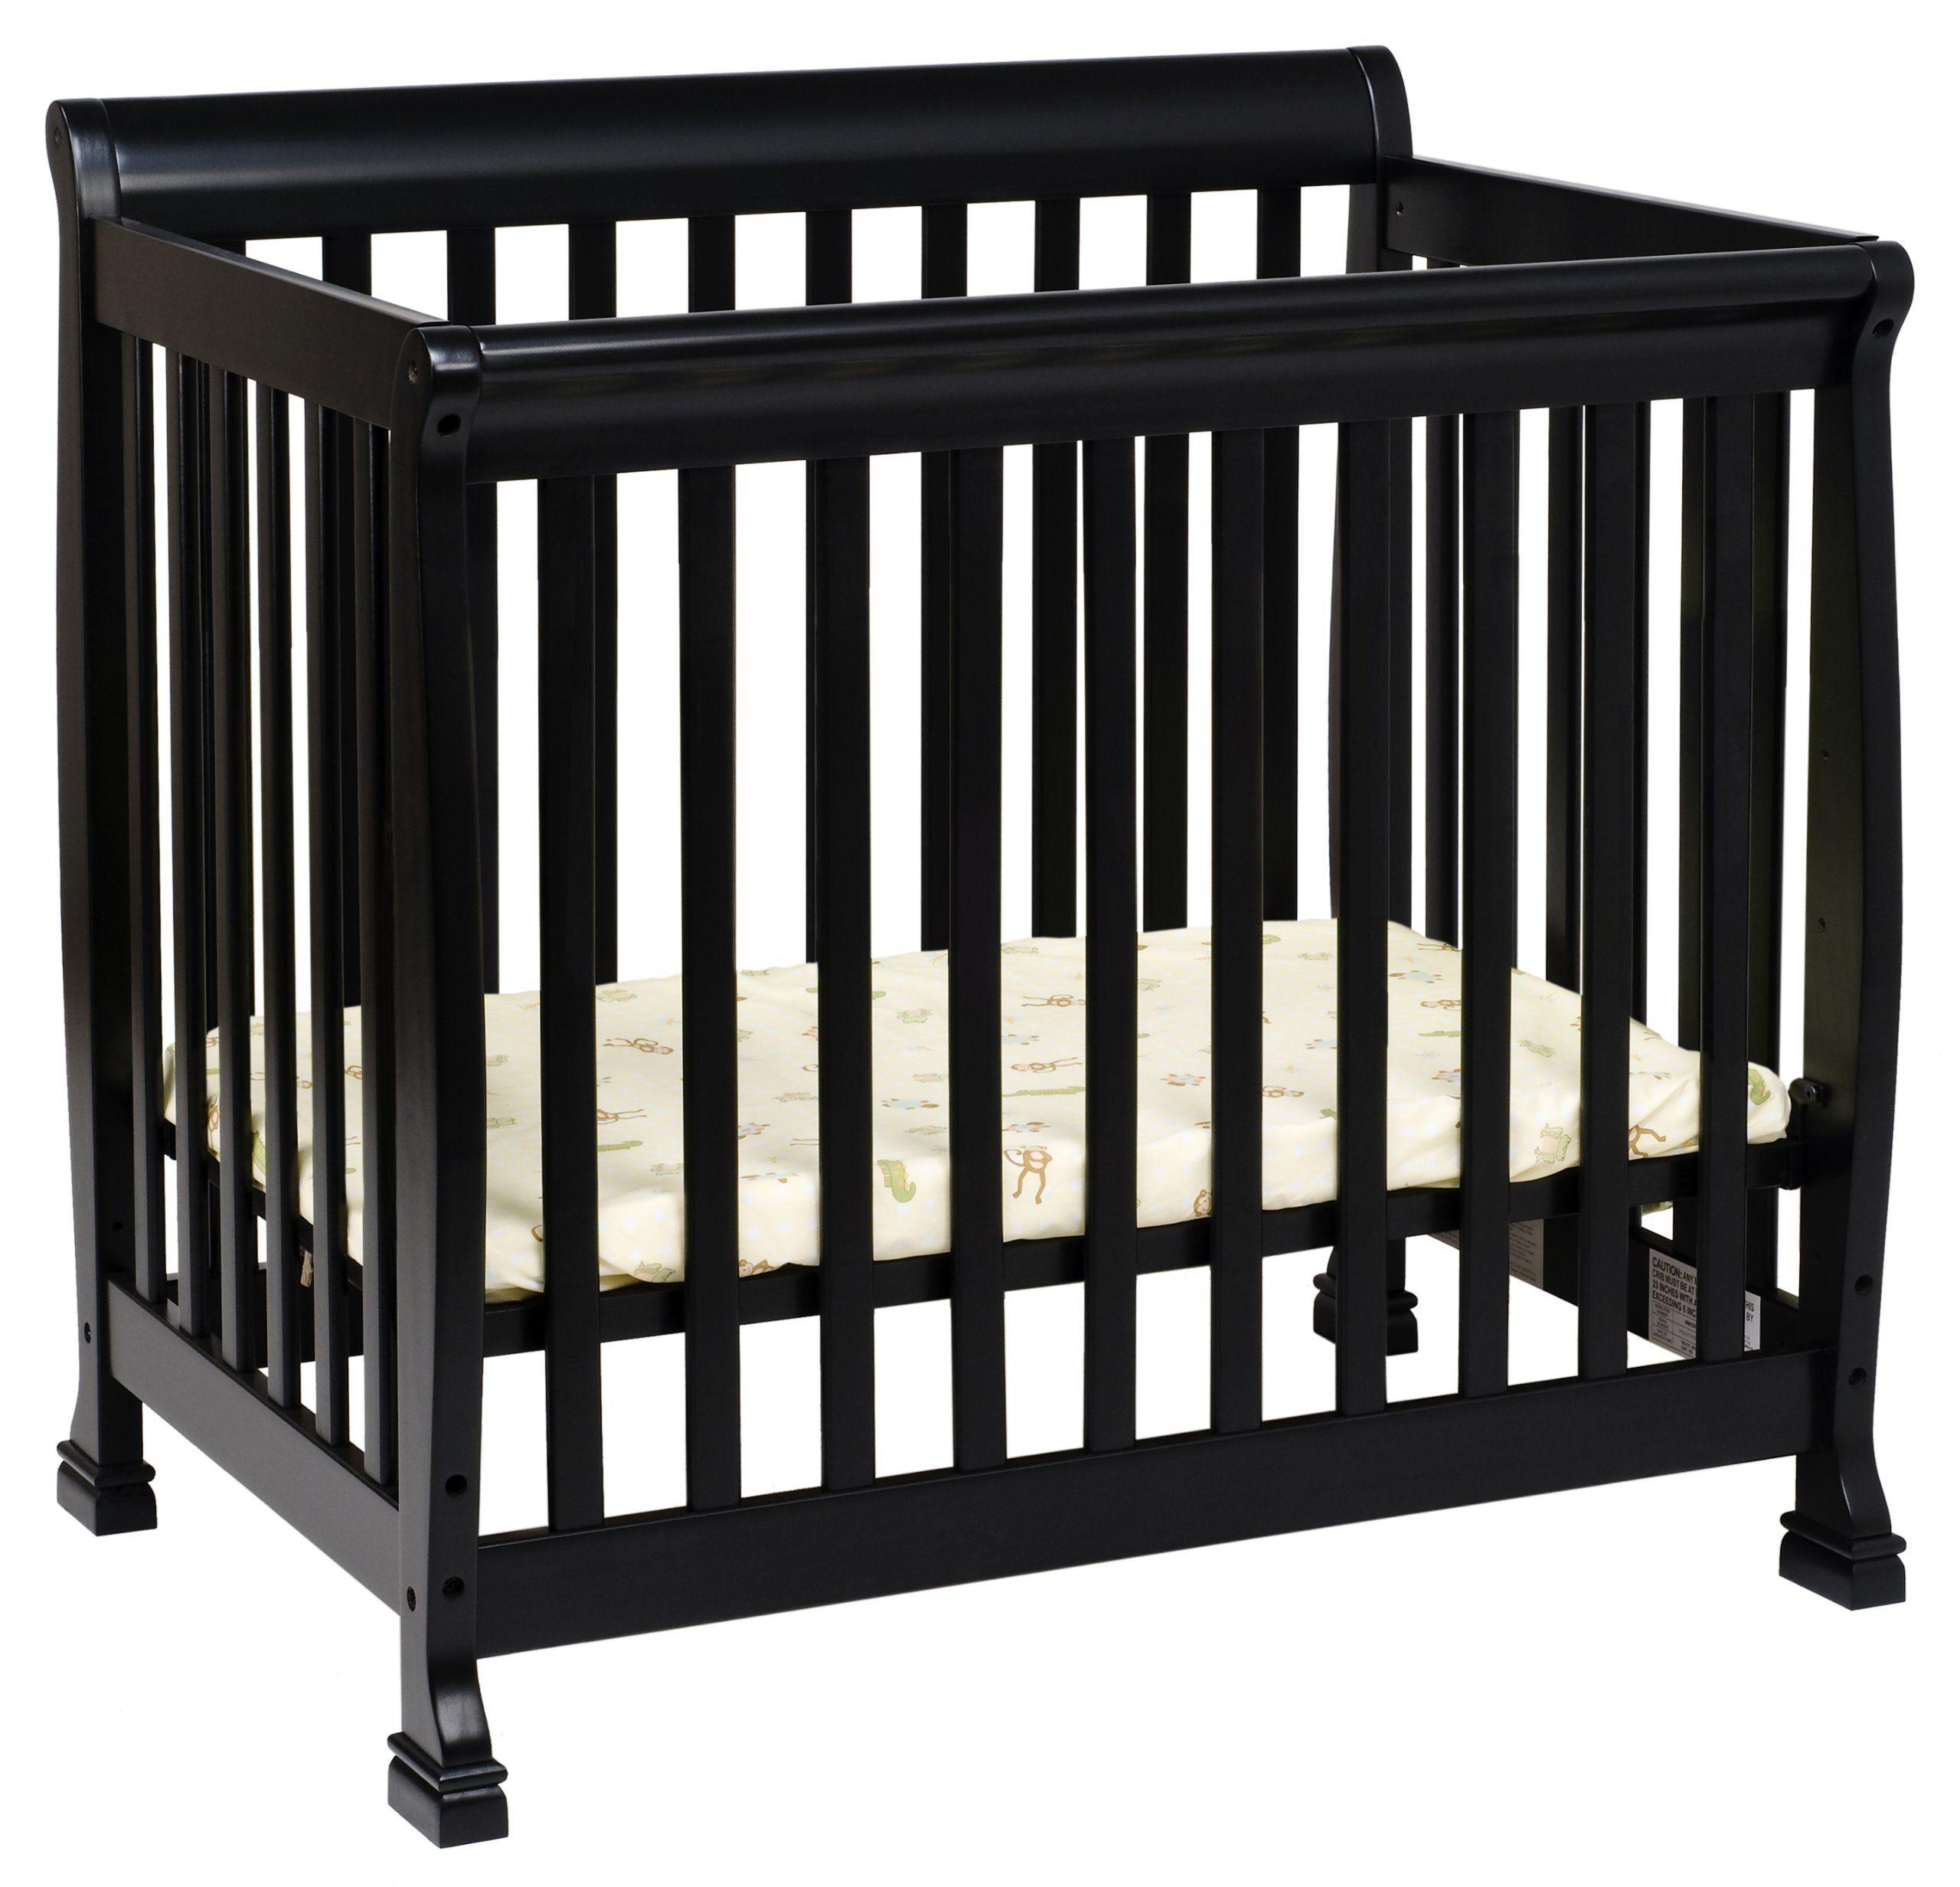 Robot Check Mini Crib Cribs Small Crib